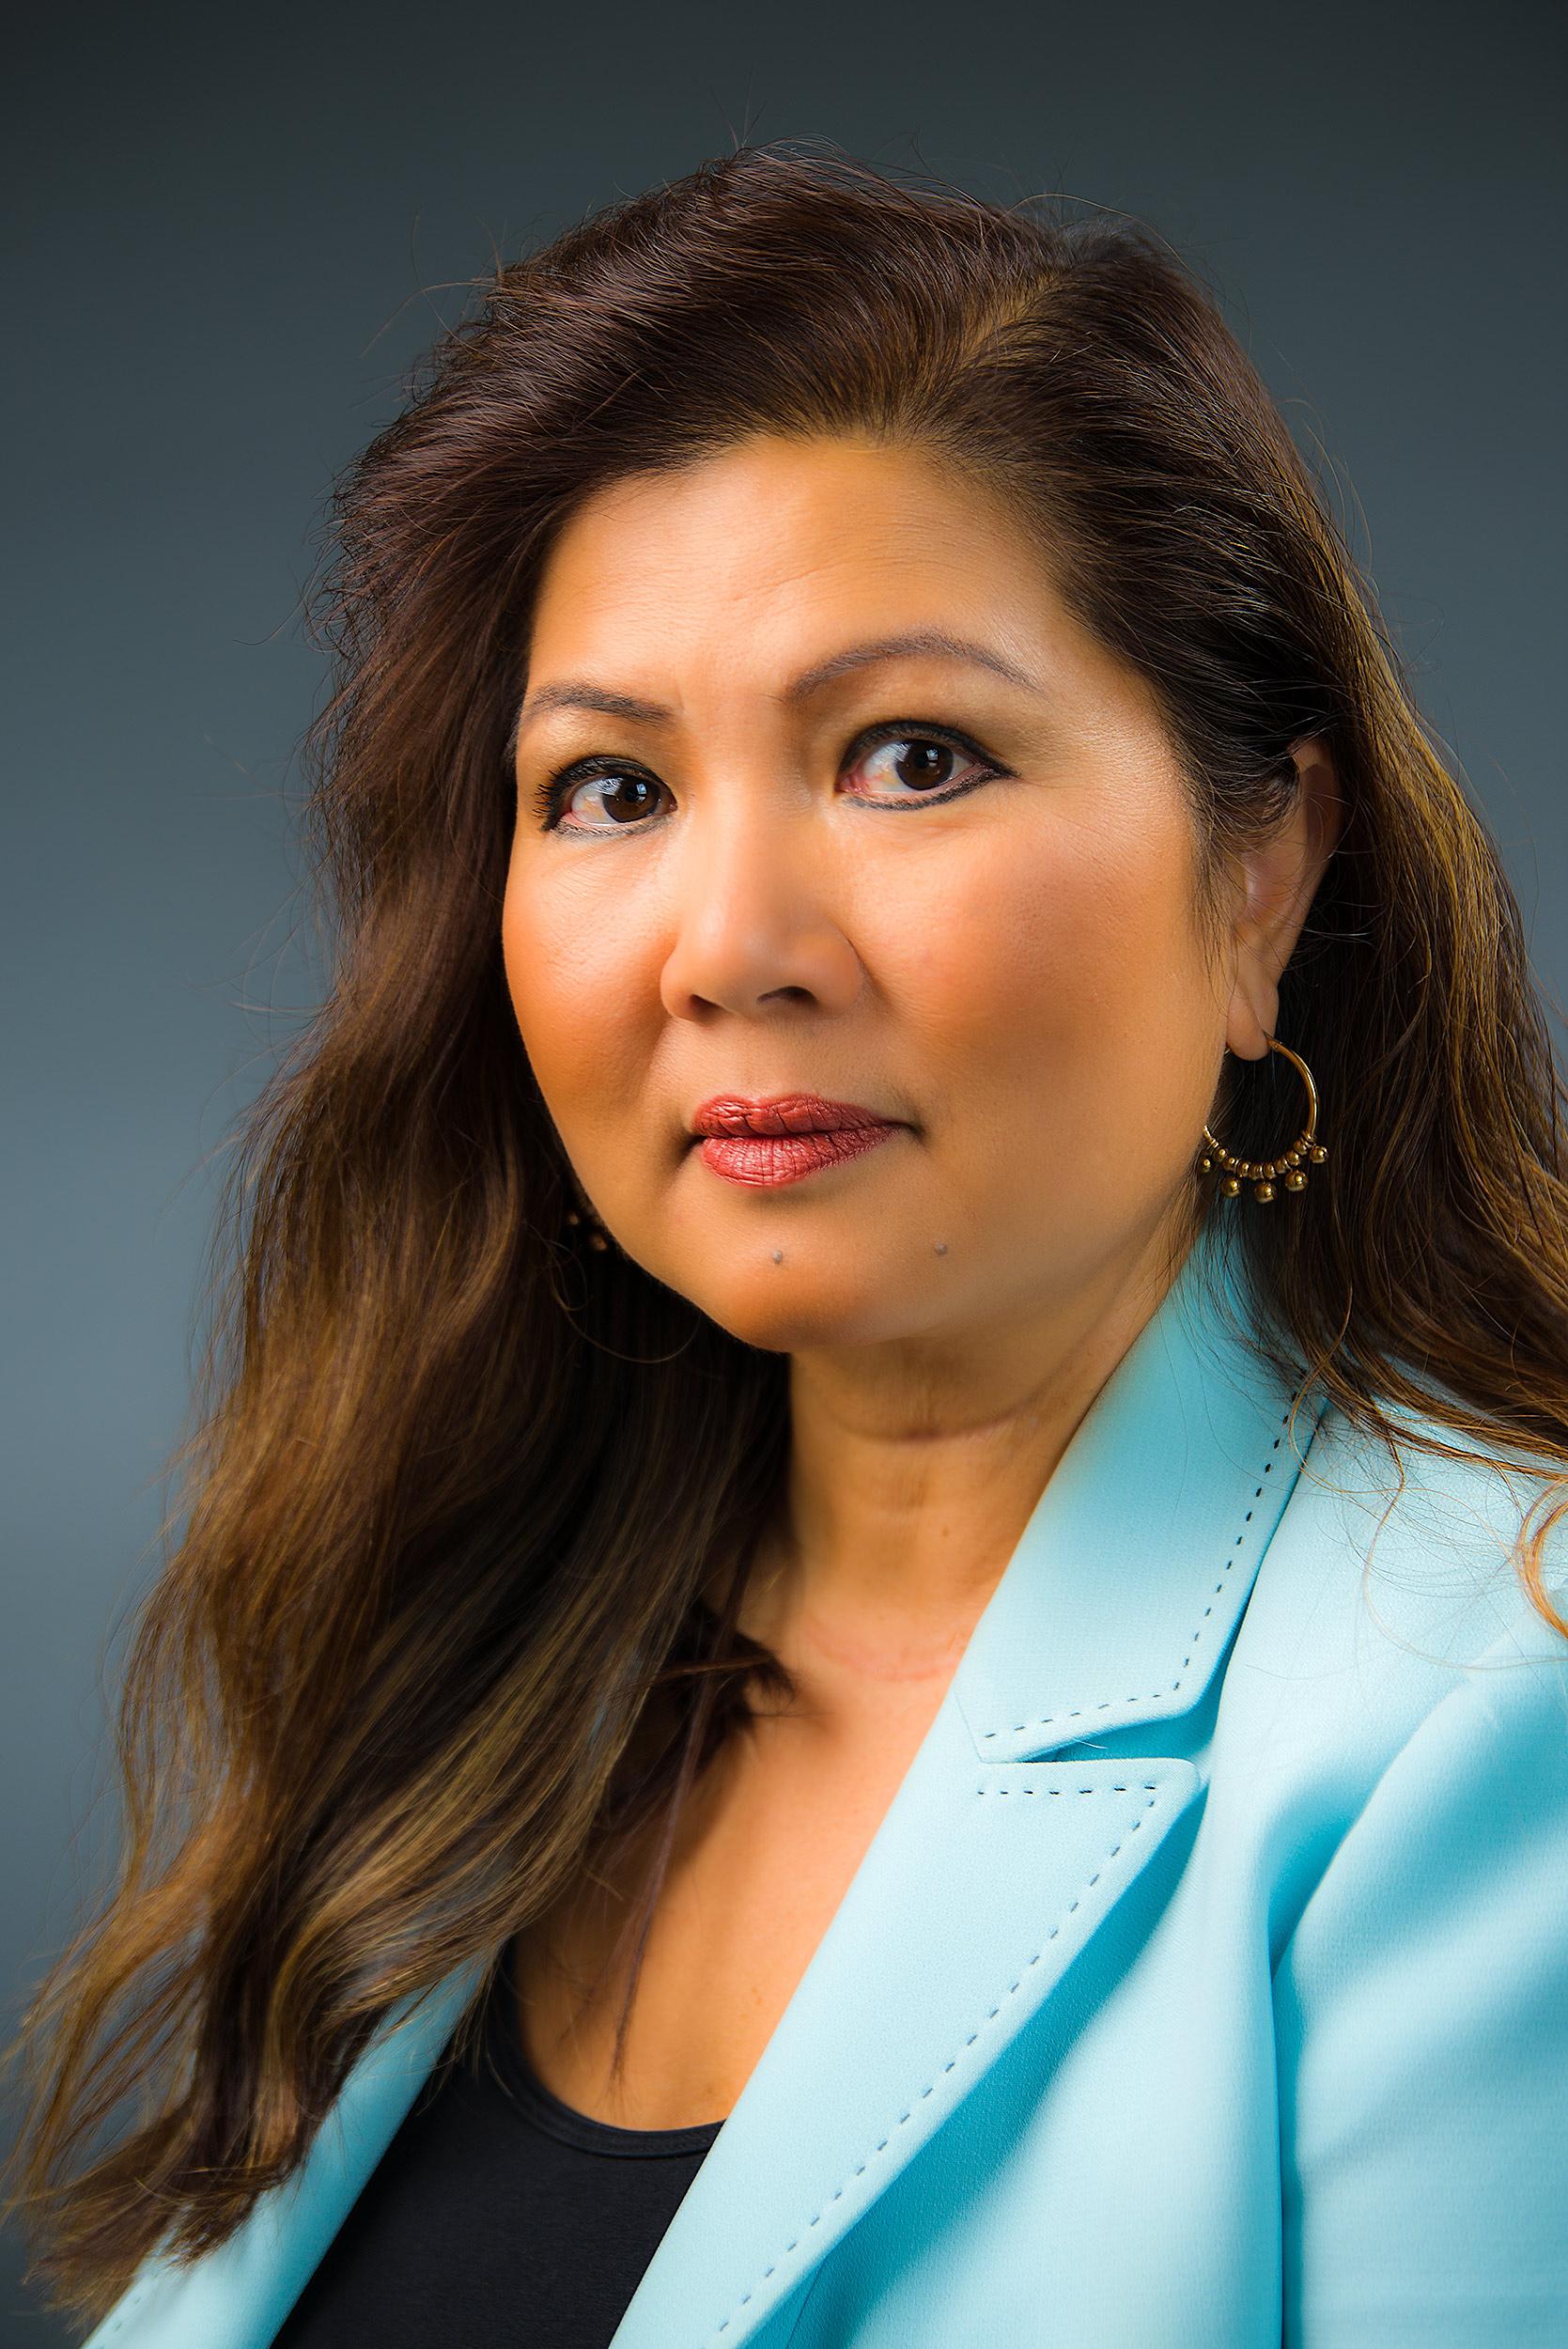 DennisSoansPhotography Portrait Headshot Fairfax VA